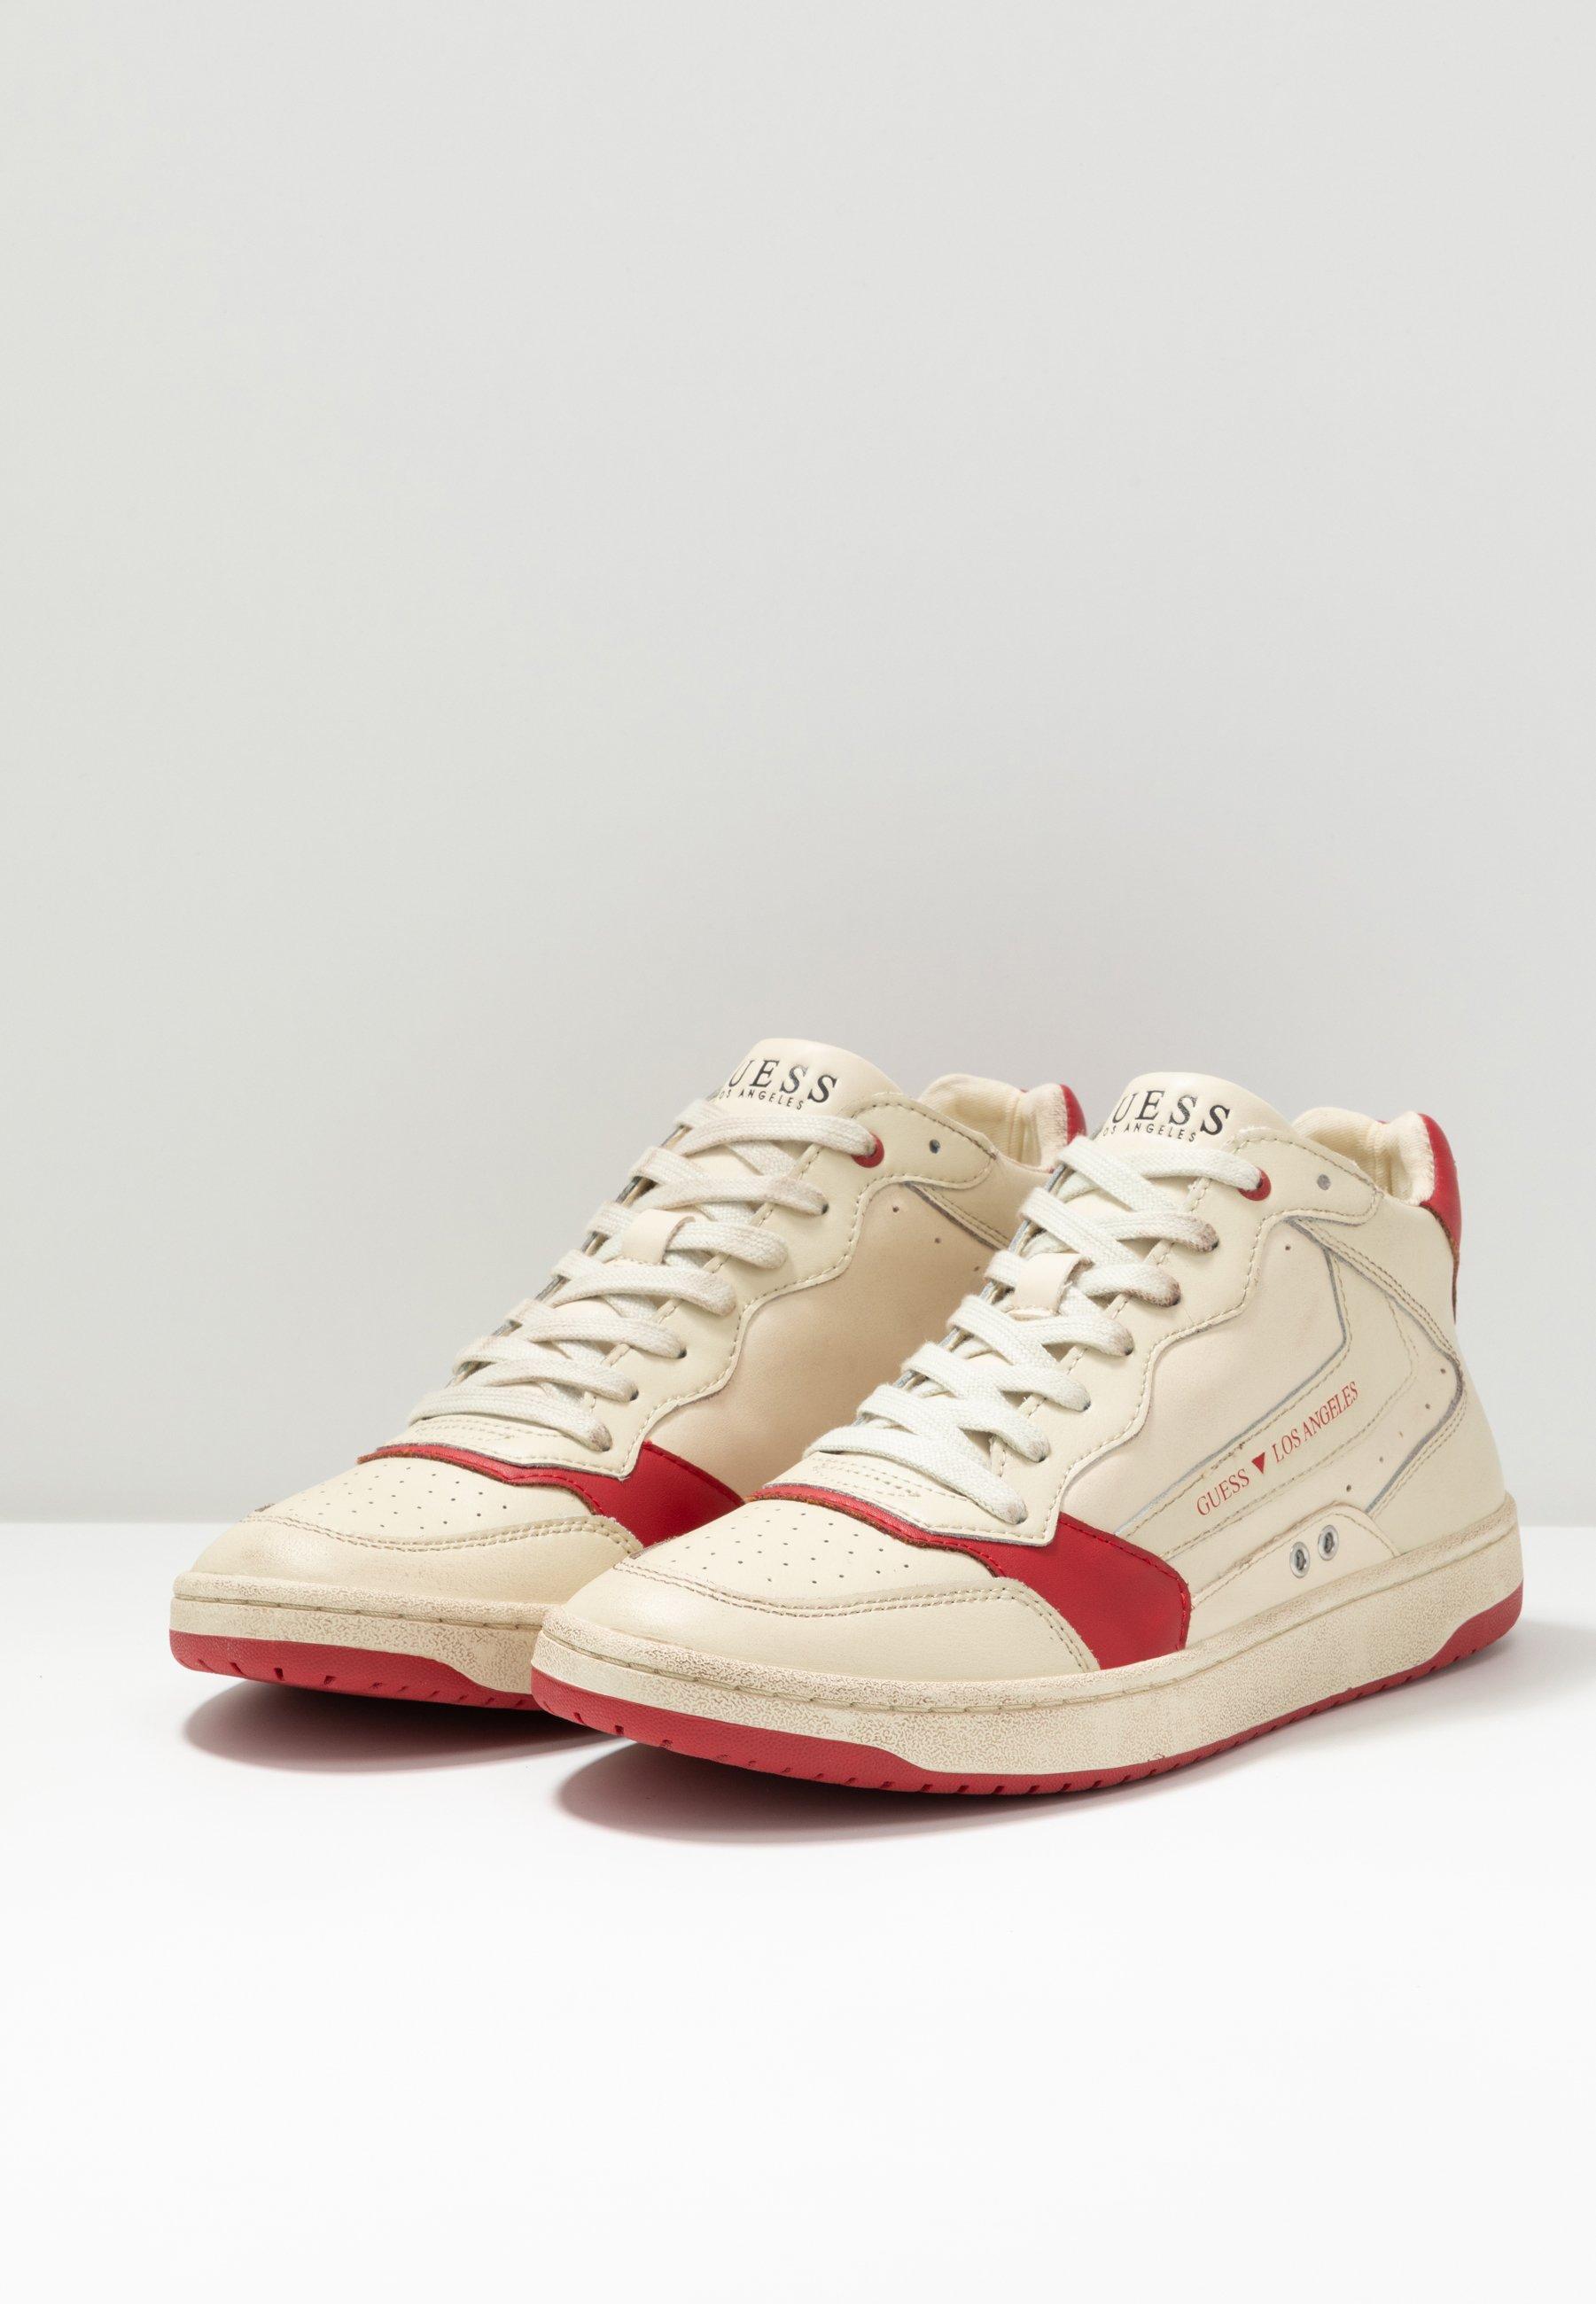 Guess PESARO MID - Sneaker high - white/red/weiß - Herrenschuhe W8uyq